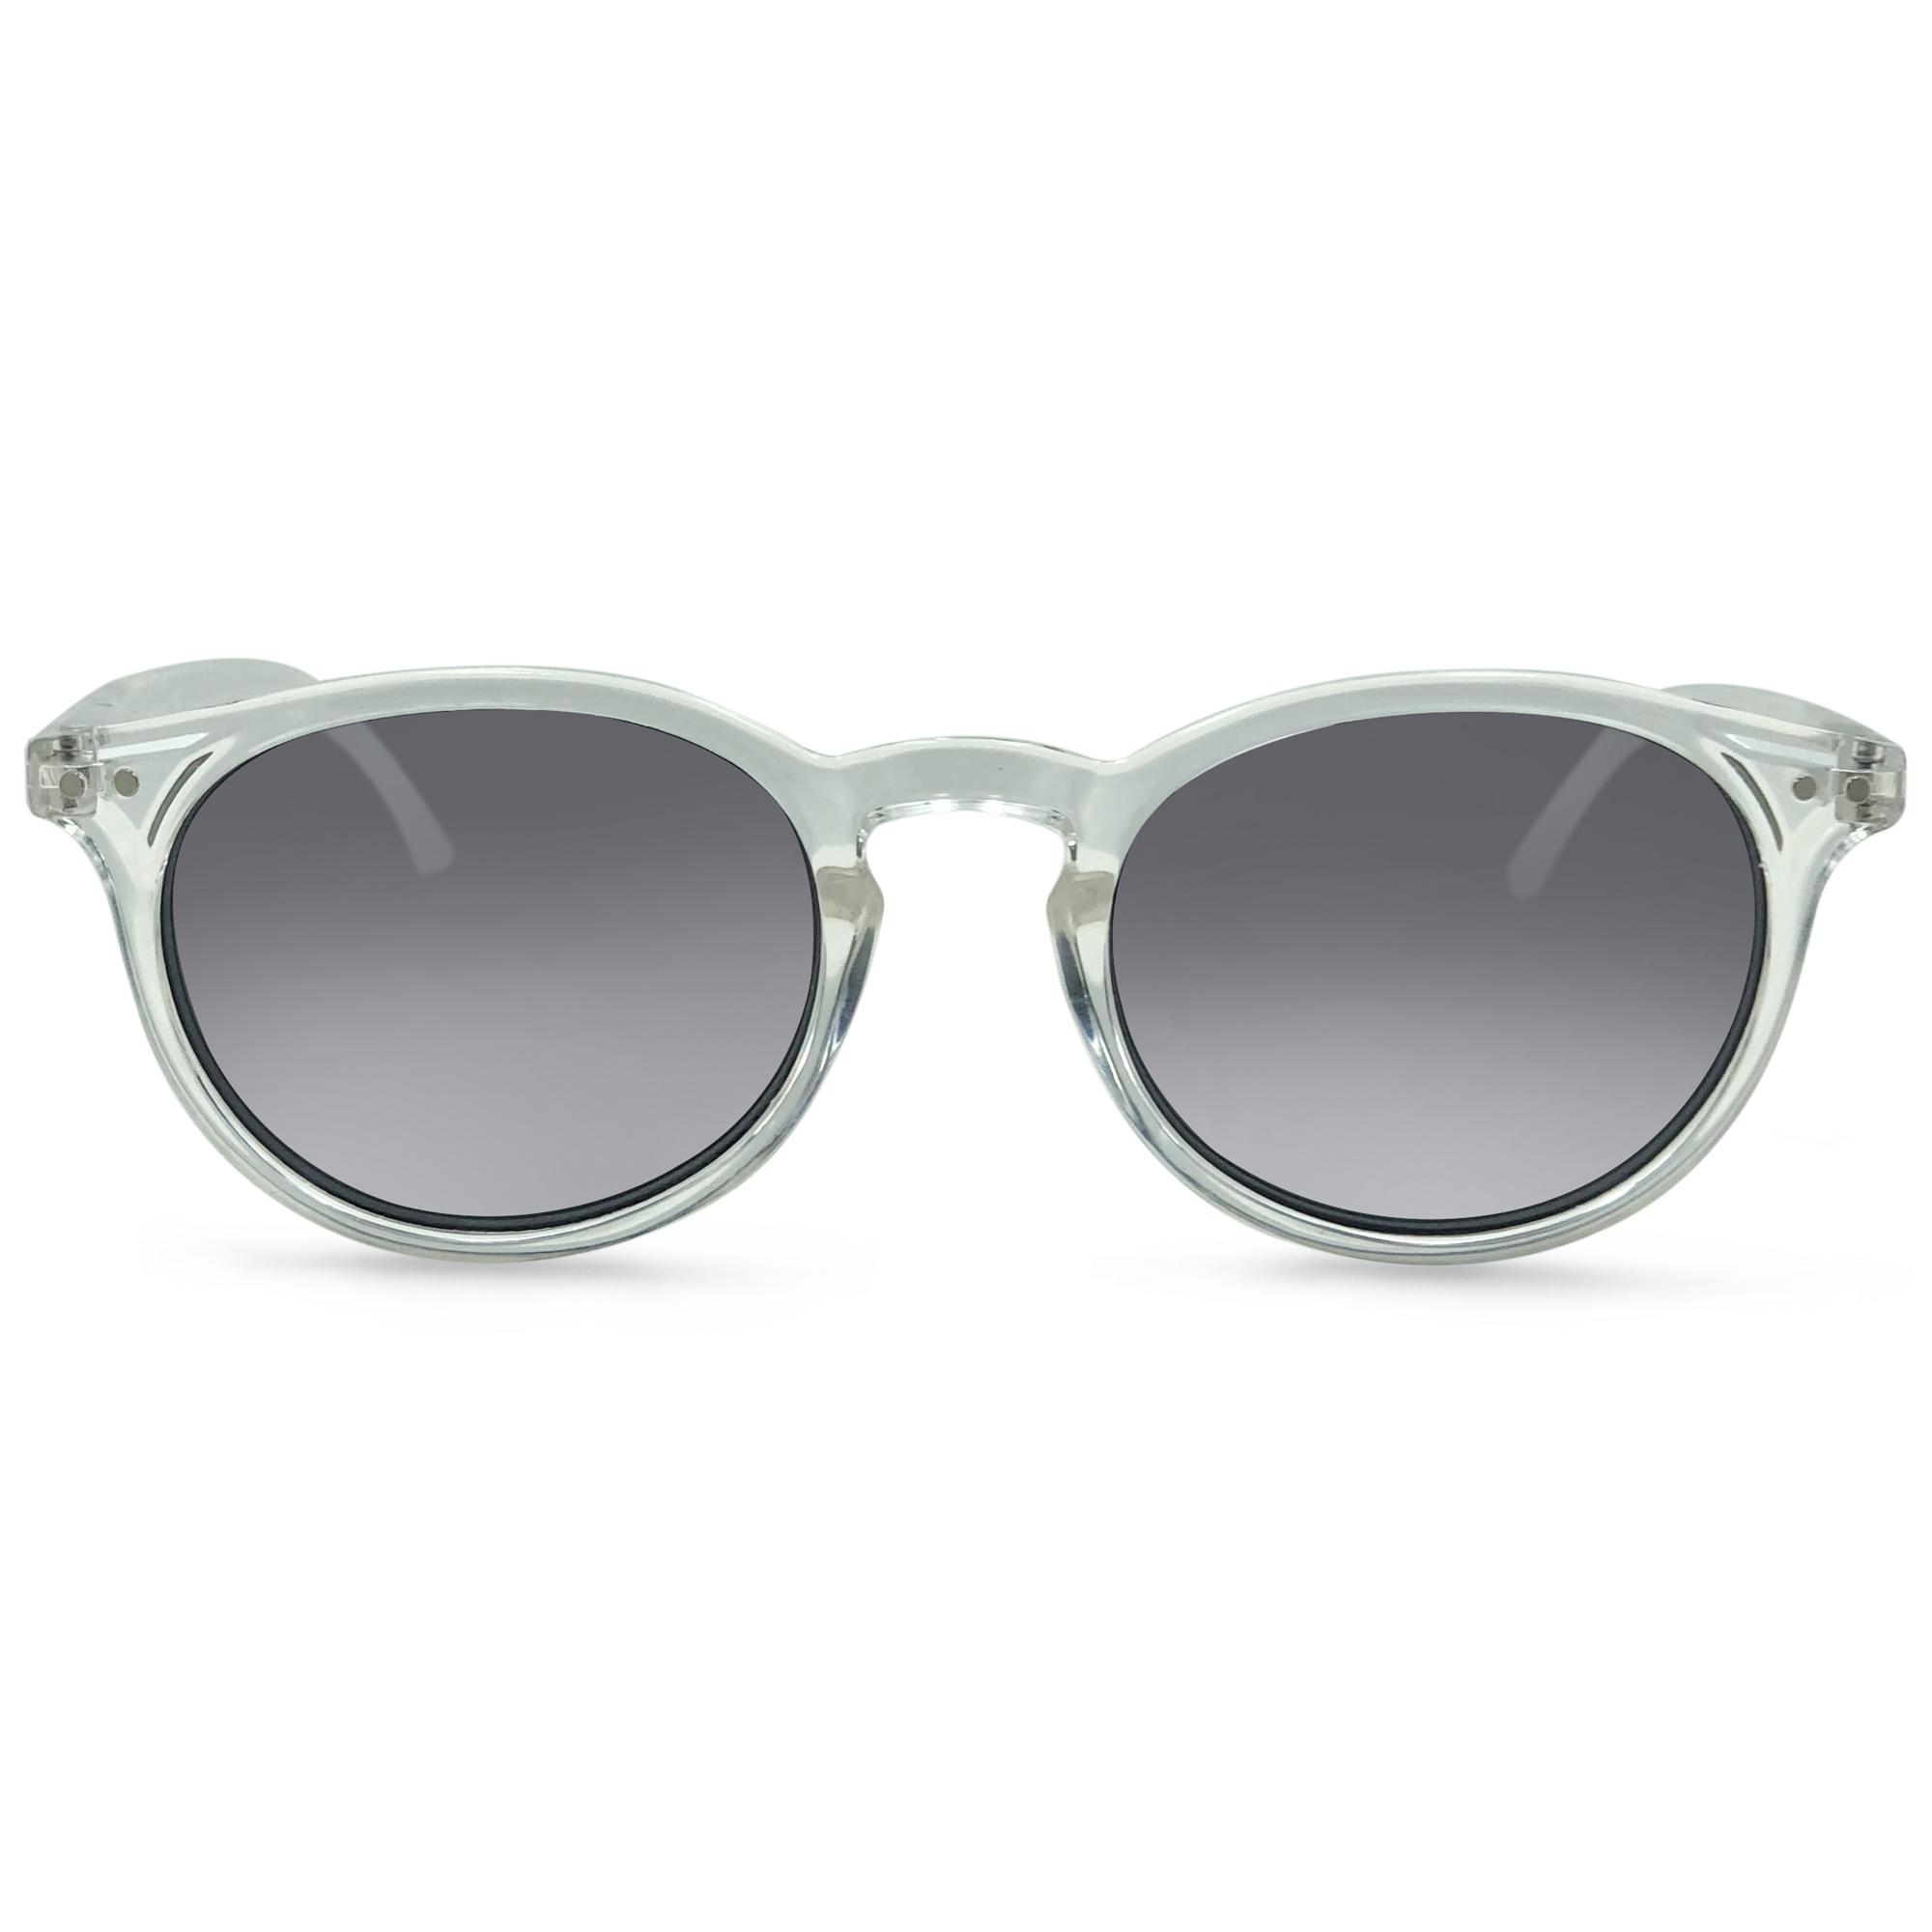 9d3768cca02d In Style Eyes Flexible Full Reader Sunglasses Eyewear Frames Not bifocals